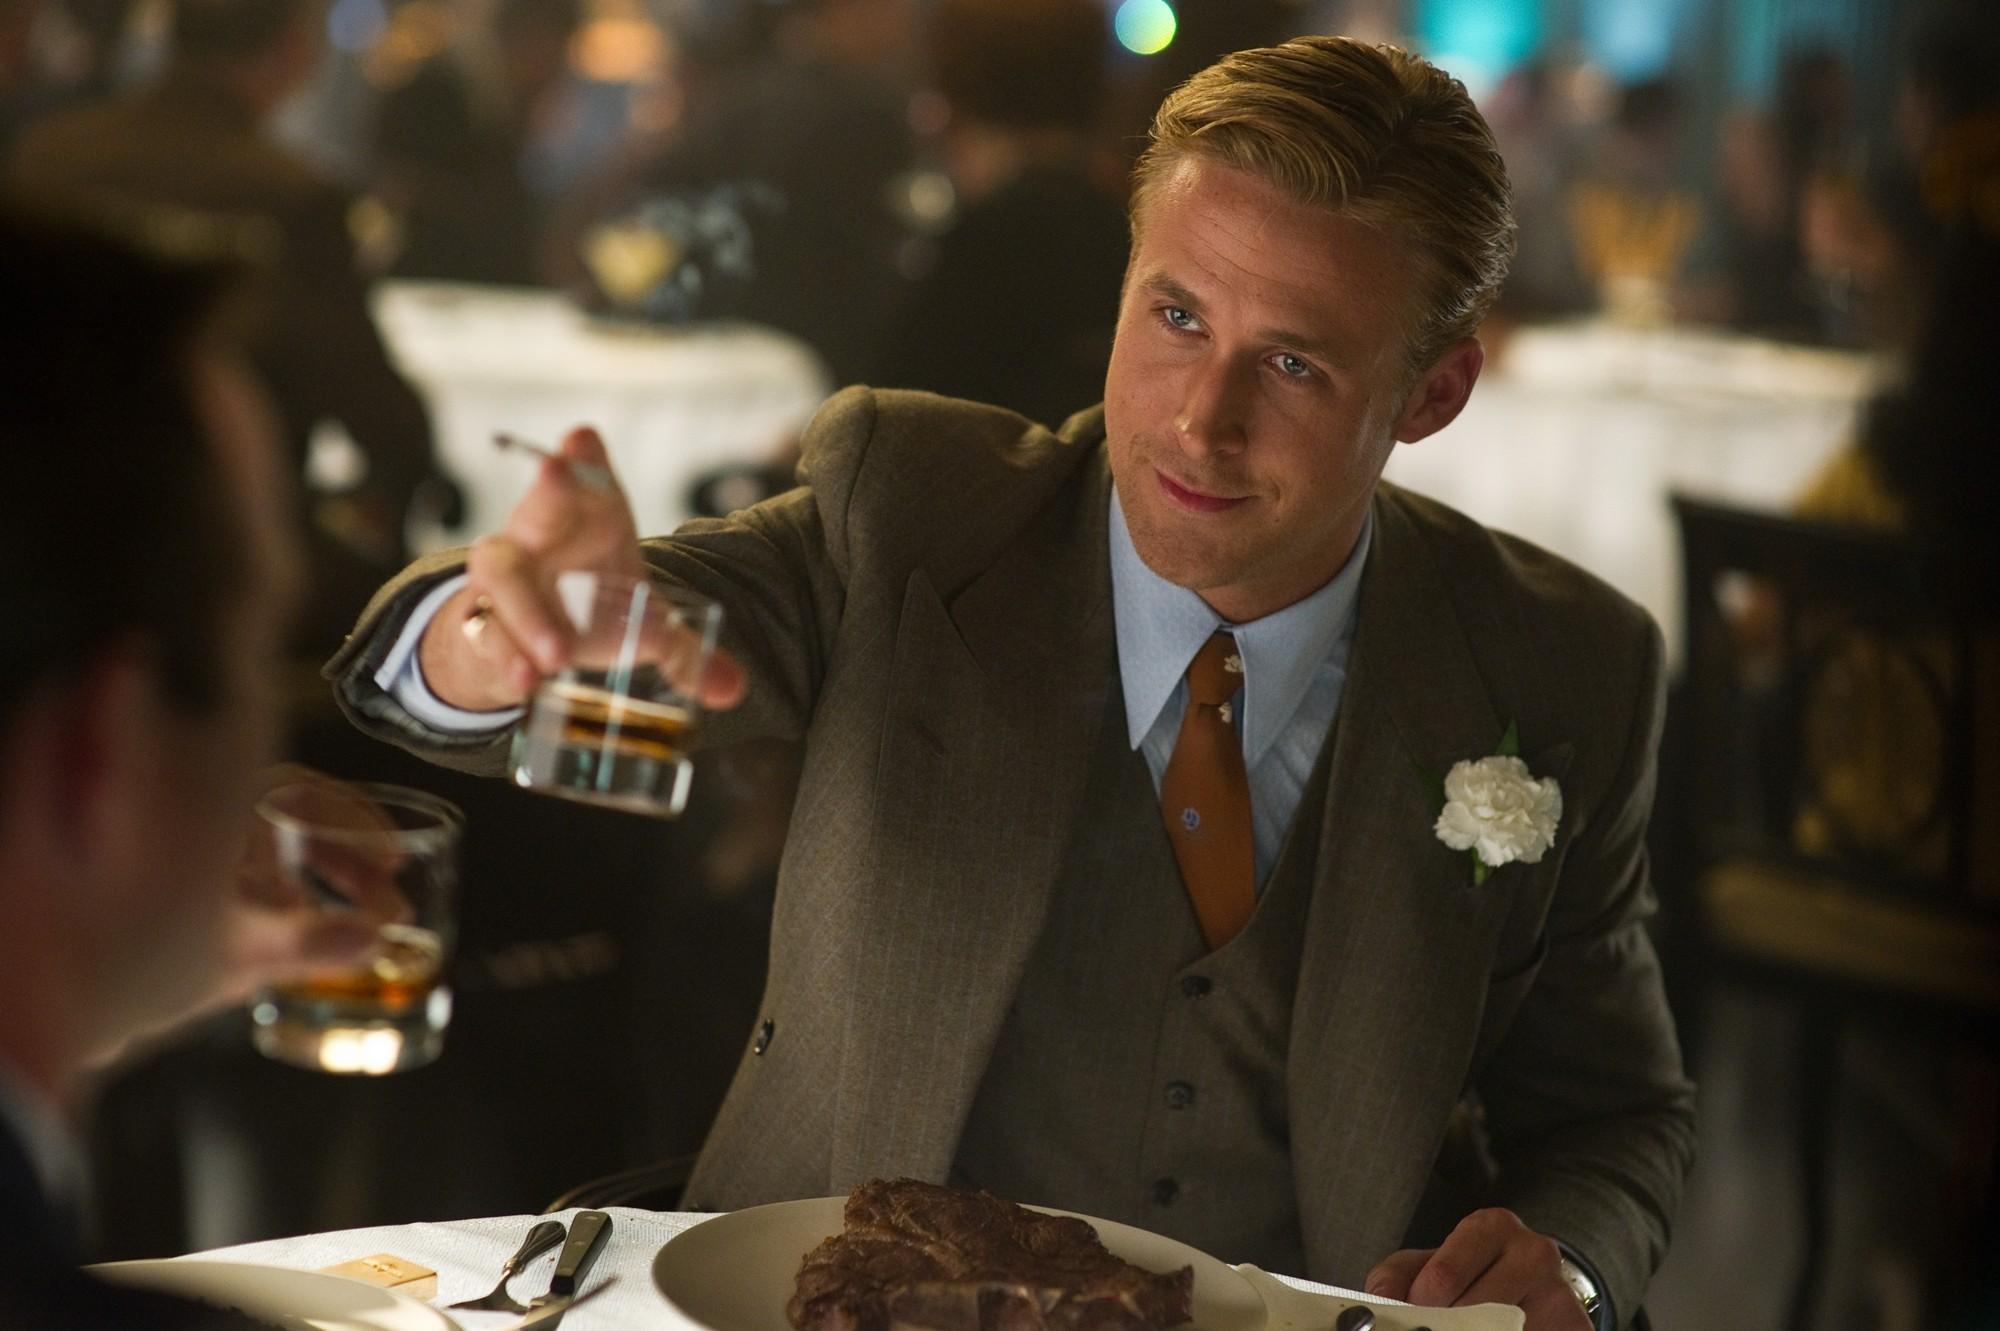 35 Ryan Gosling Fashion Looks For His 35th Birthday